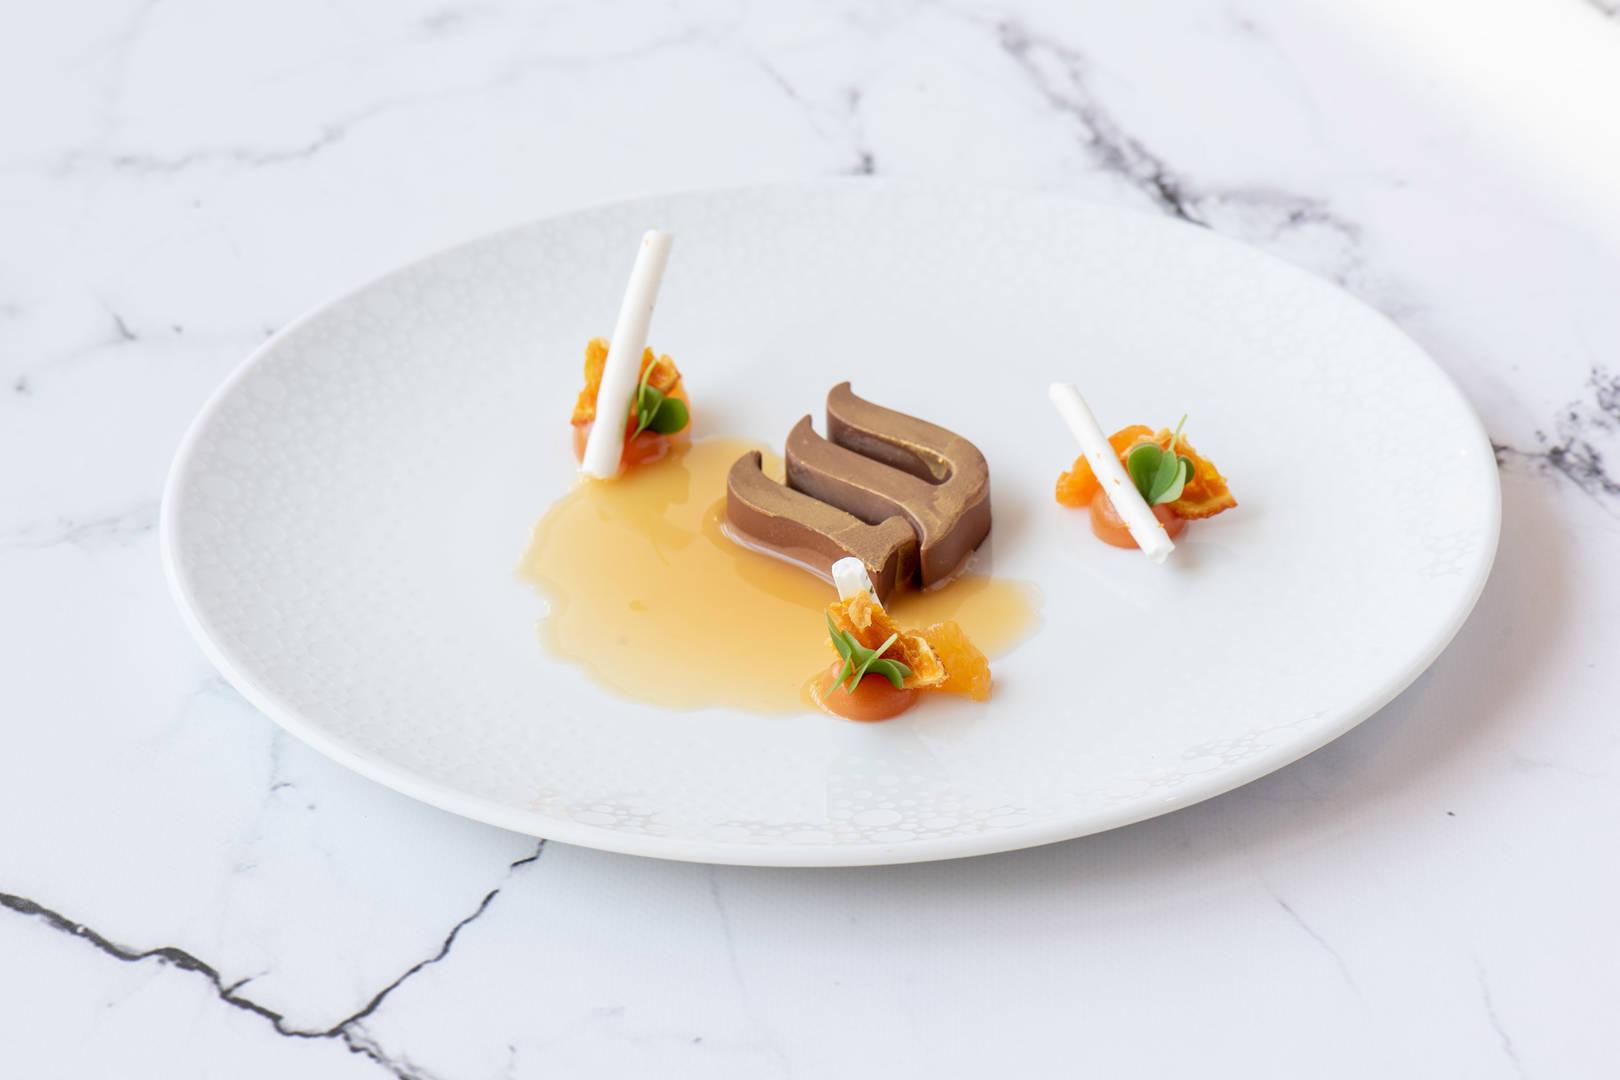 https://cdn.jumeirah.com/-/mediadh/DH/Hospitality/Jumeirah/Restaurants/Frankfurt/Frankfurt-Max-On-One-Grill-Room/Restaurant-Gallery/Jumeirah-Frankfurt-Beacon-Dessert-3_6-4.jpg?h=1080&w=1620&hash=D9D0EE20FE97A41054342BB148C037AA